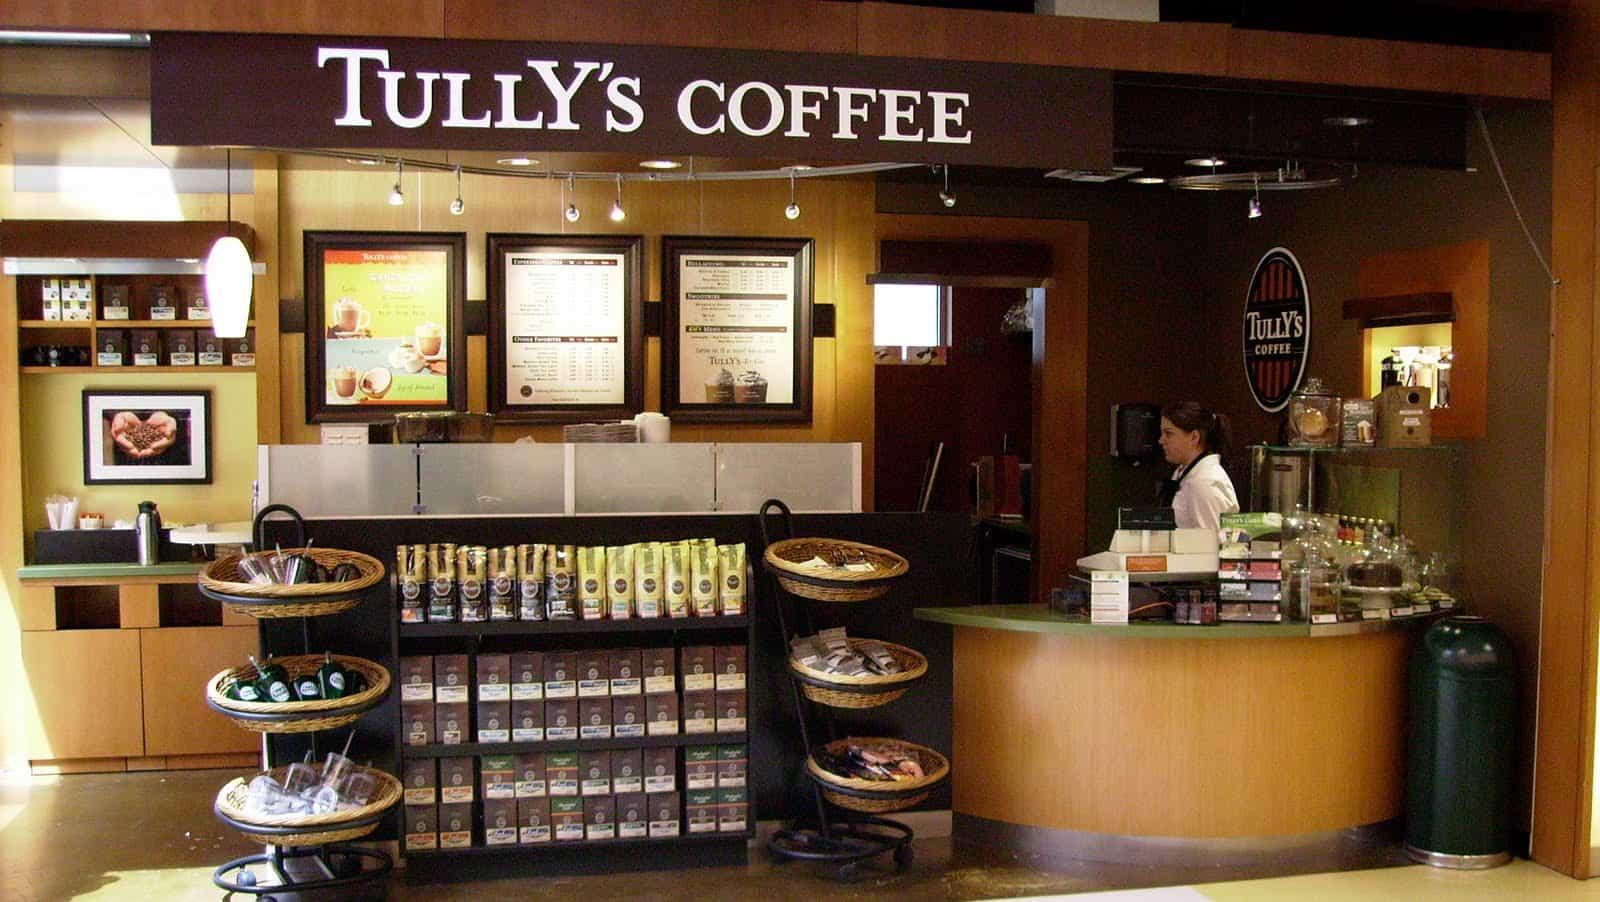 tullys coffee seattle uma alternativa de bom caf em seattle. Black Bedroom Furniture Sets. Home Design Ideas